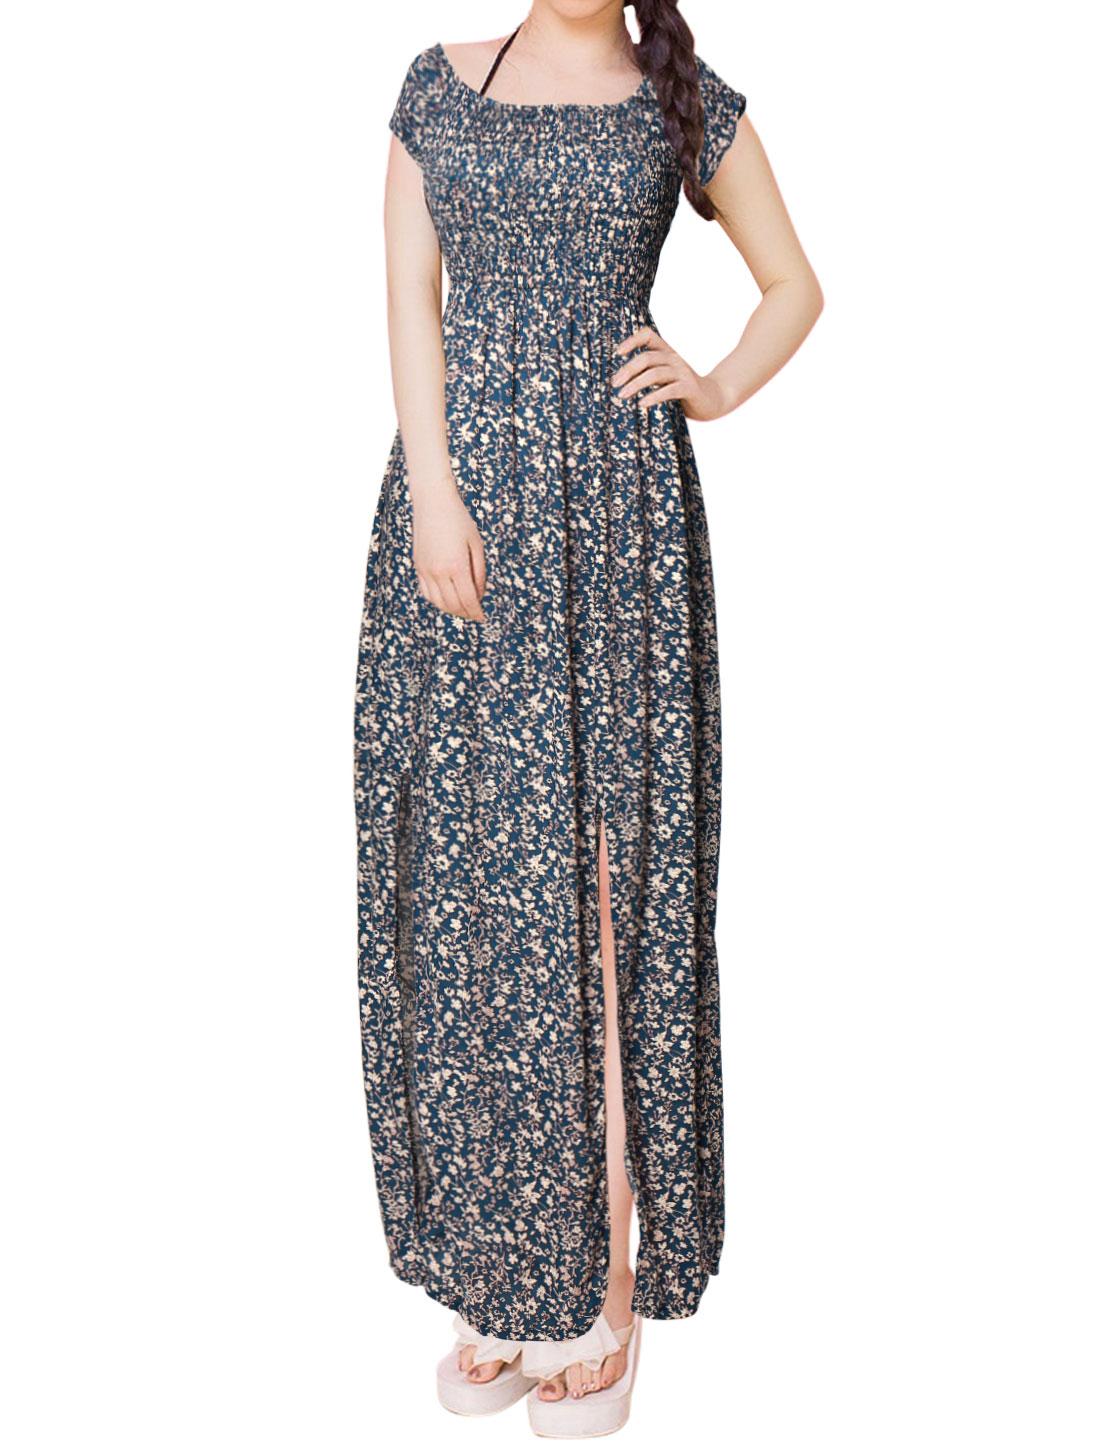 Women Smocked Upper Double Slits Floral Long Empire Waist Dress Blue S